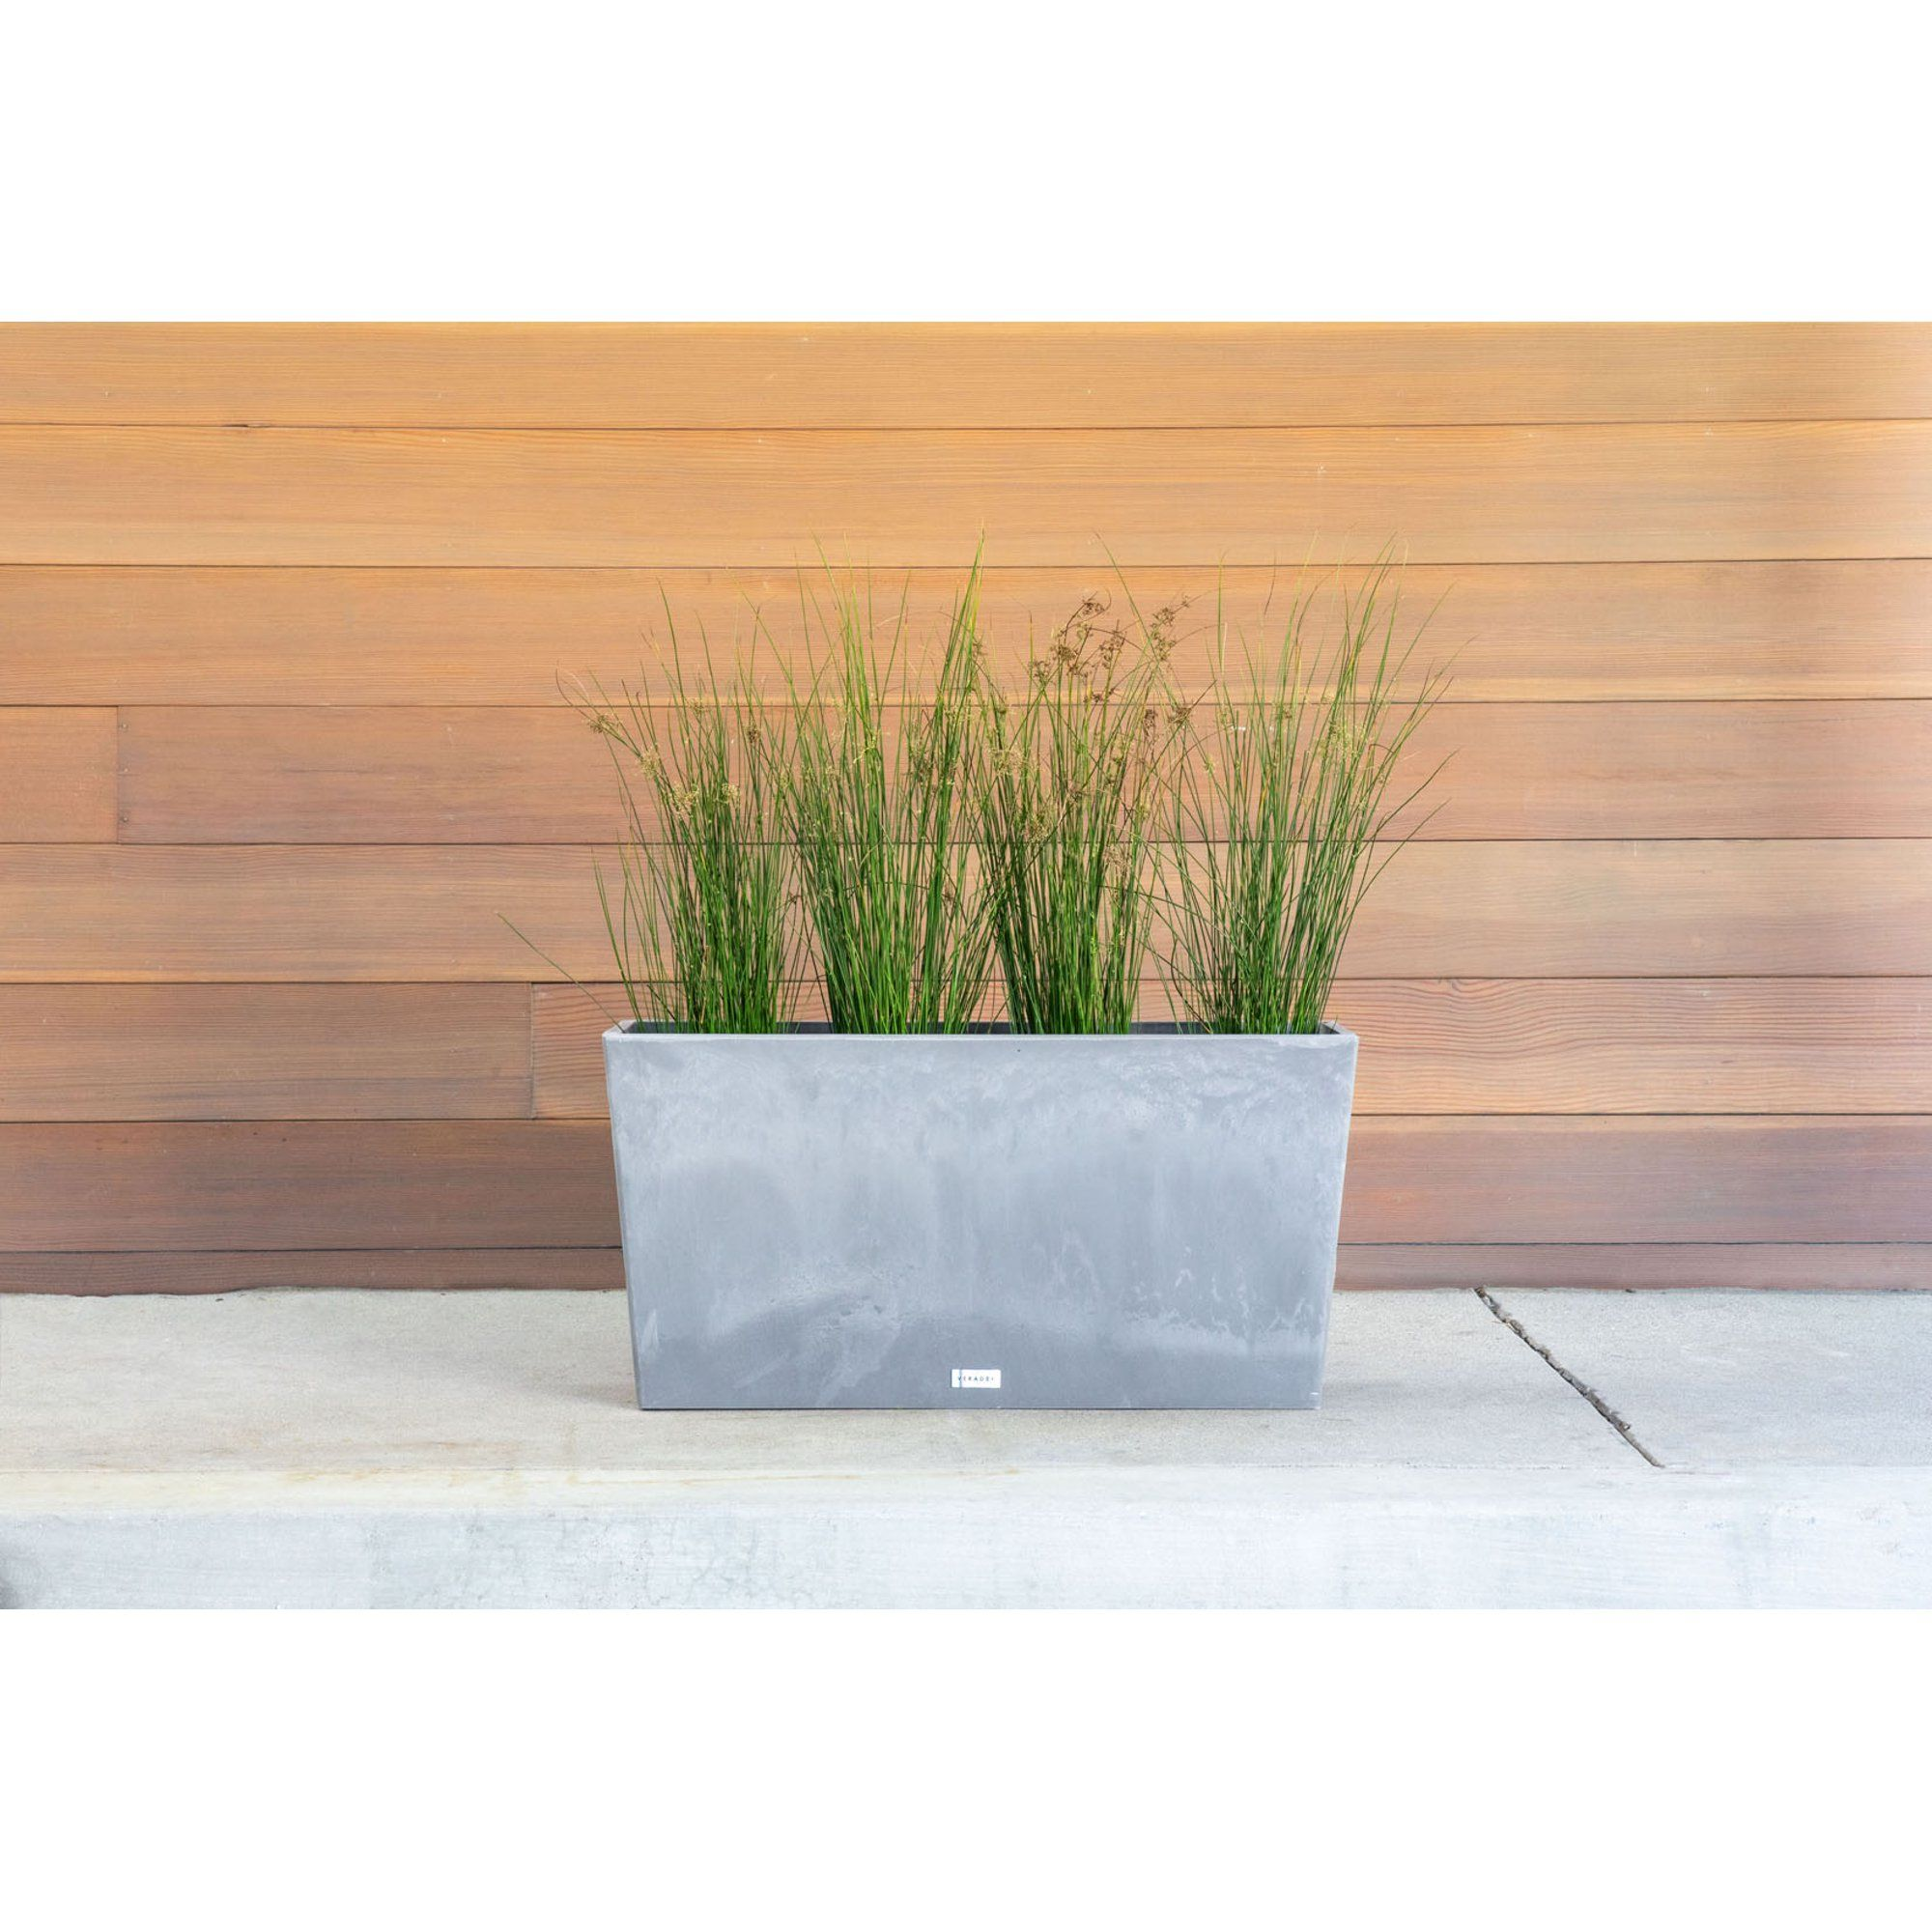 "Veradek Midori 31"" Trough Planter Charcoal"